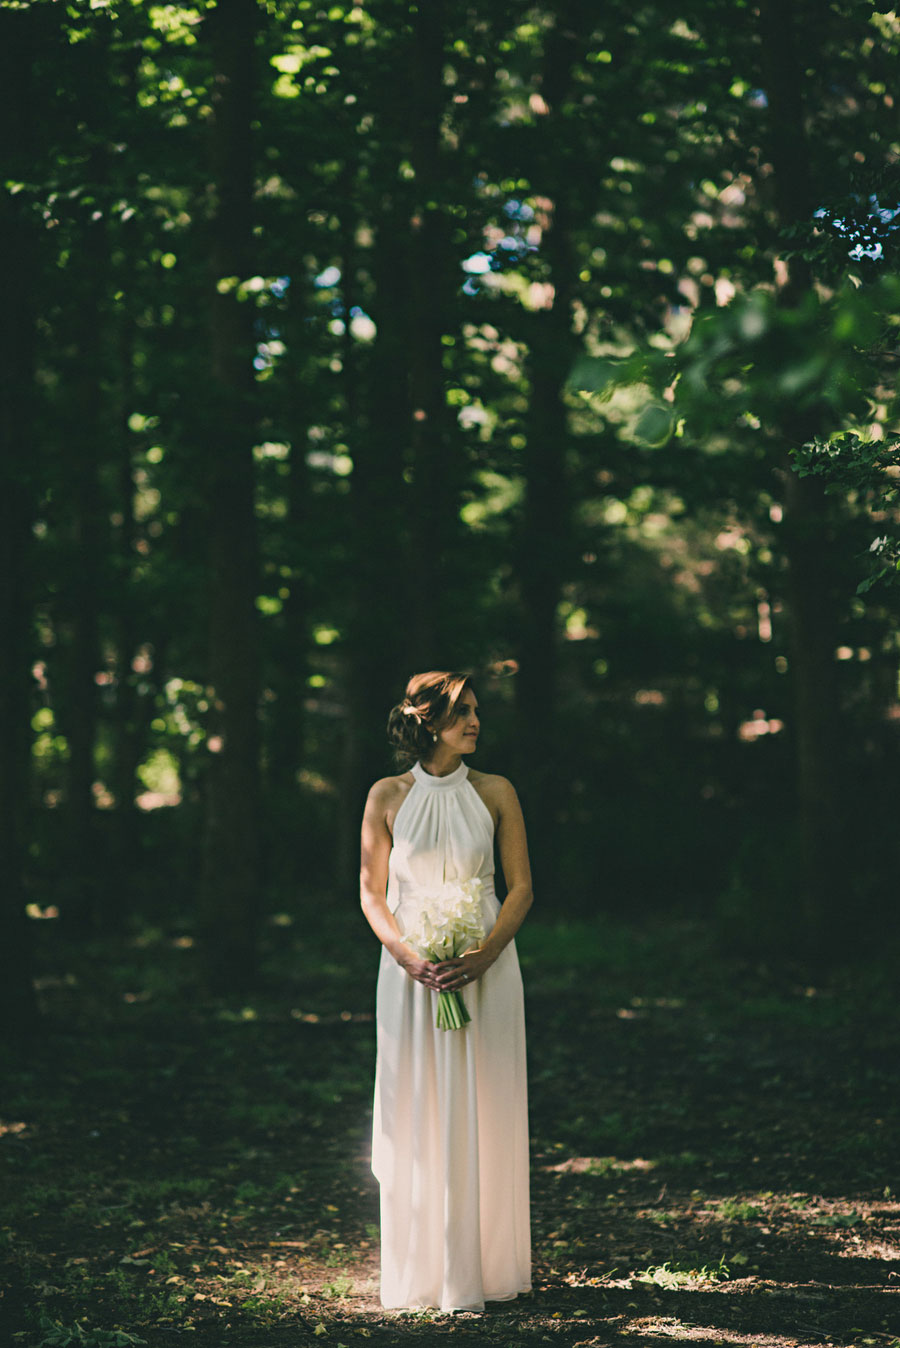 wedding-photography-sorrento-bonnie-mark-078.jpg